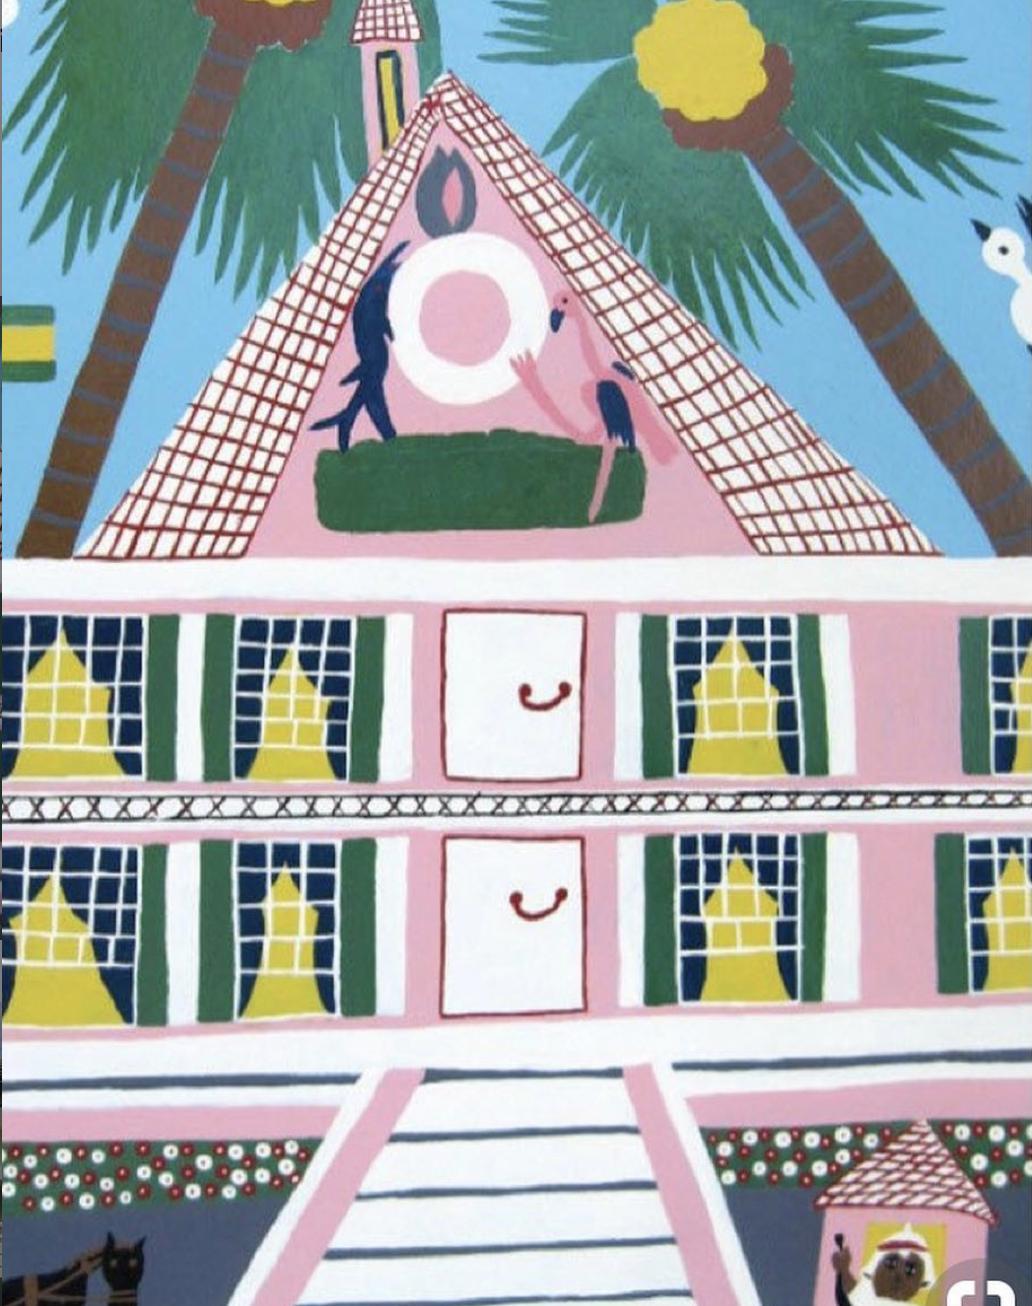 Painting by Amos Ferguson